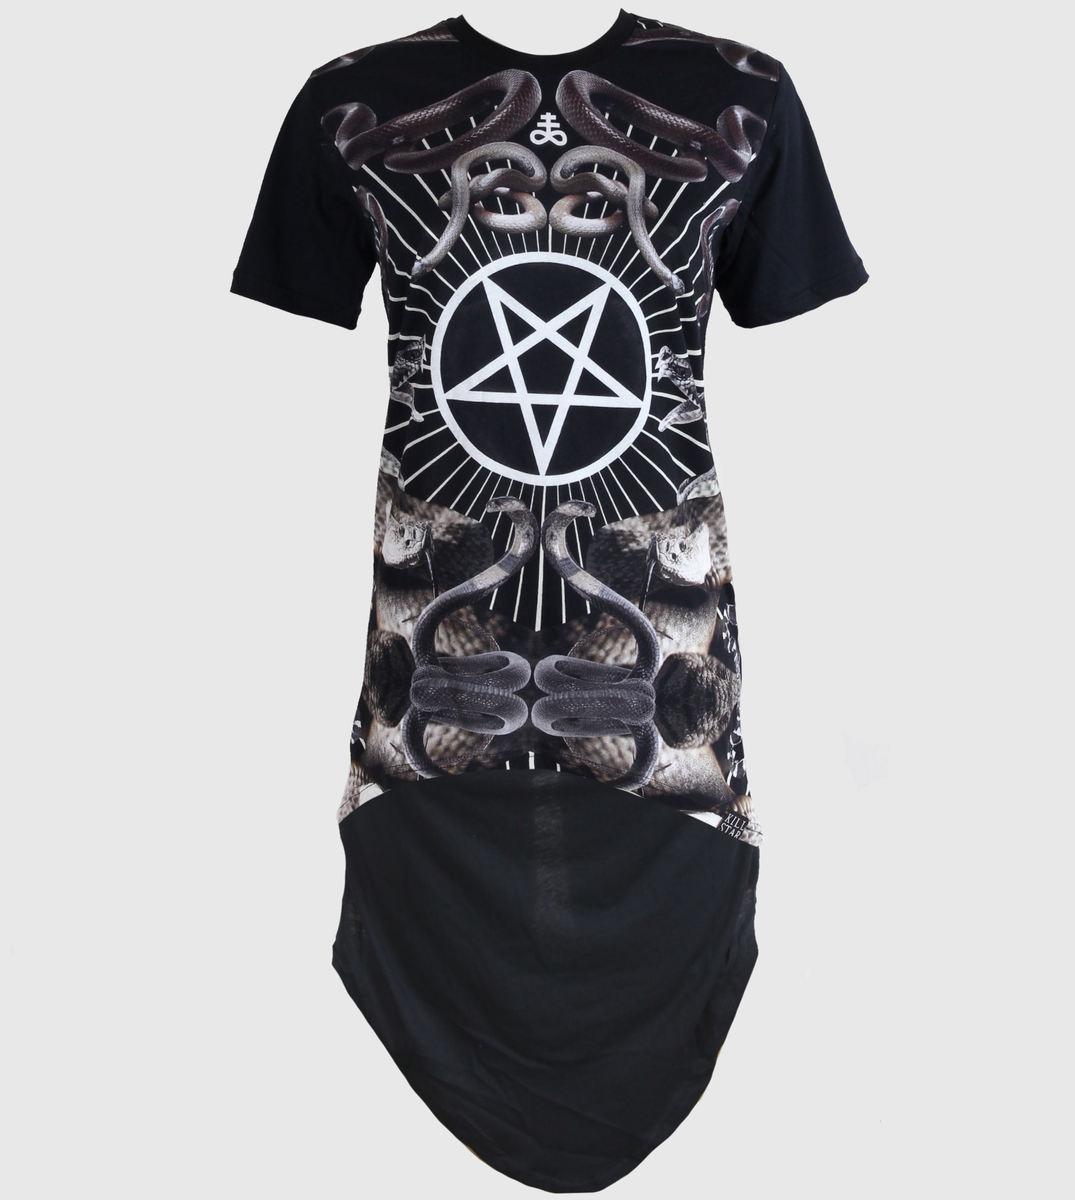 šaty dámské (tunika) KILLSTAR - Serpentine - Black - KIL236 M